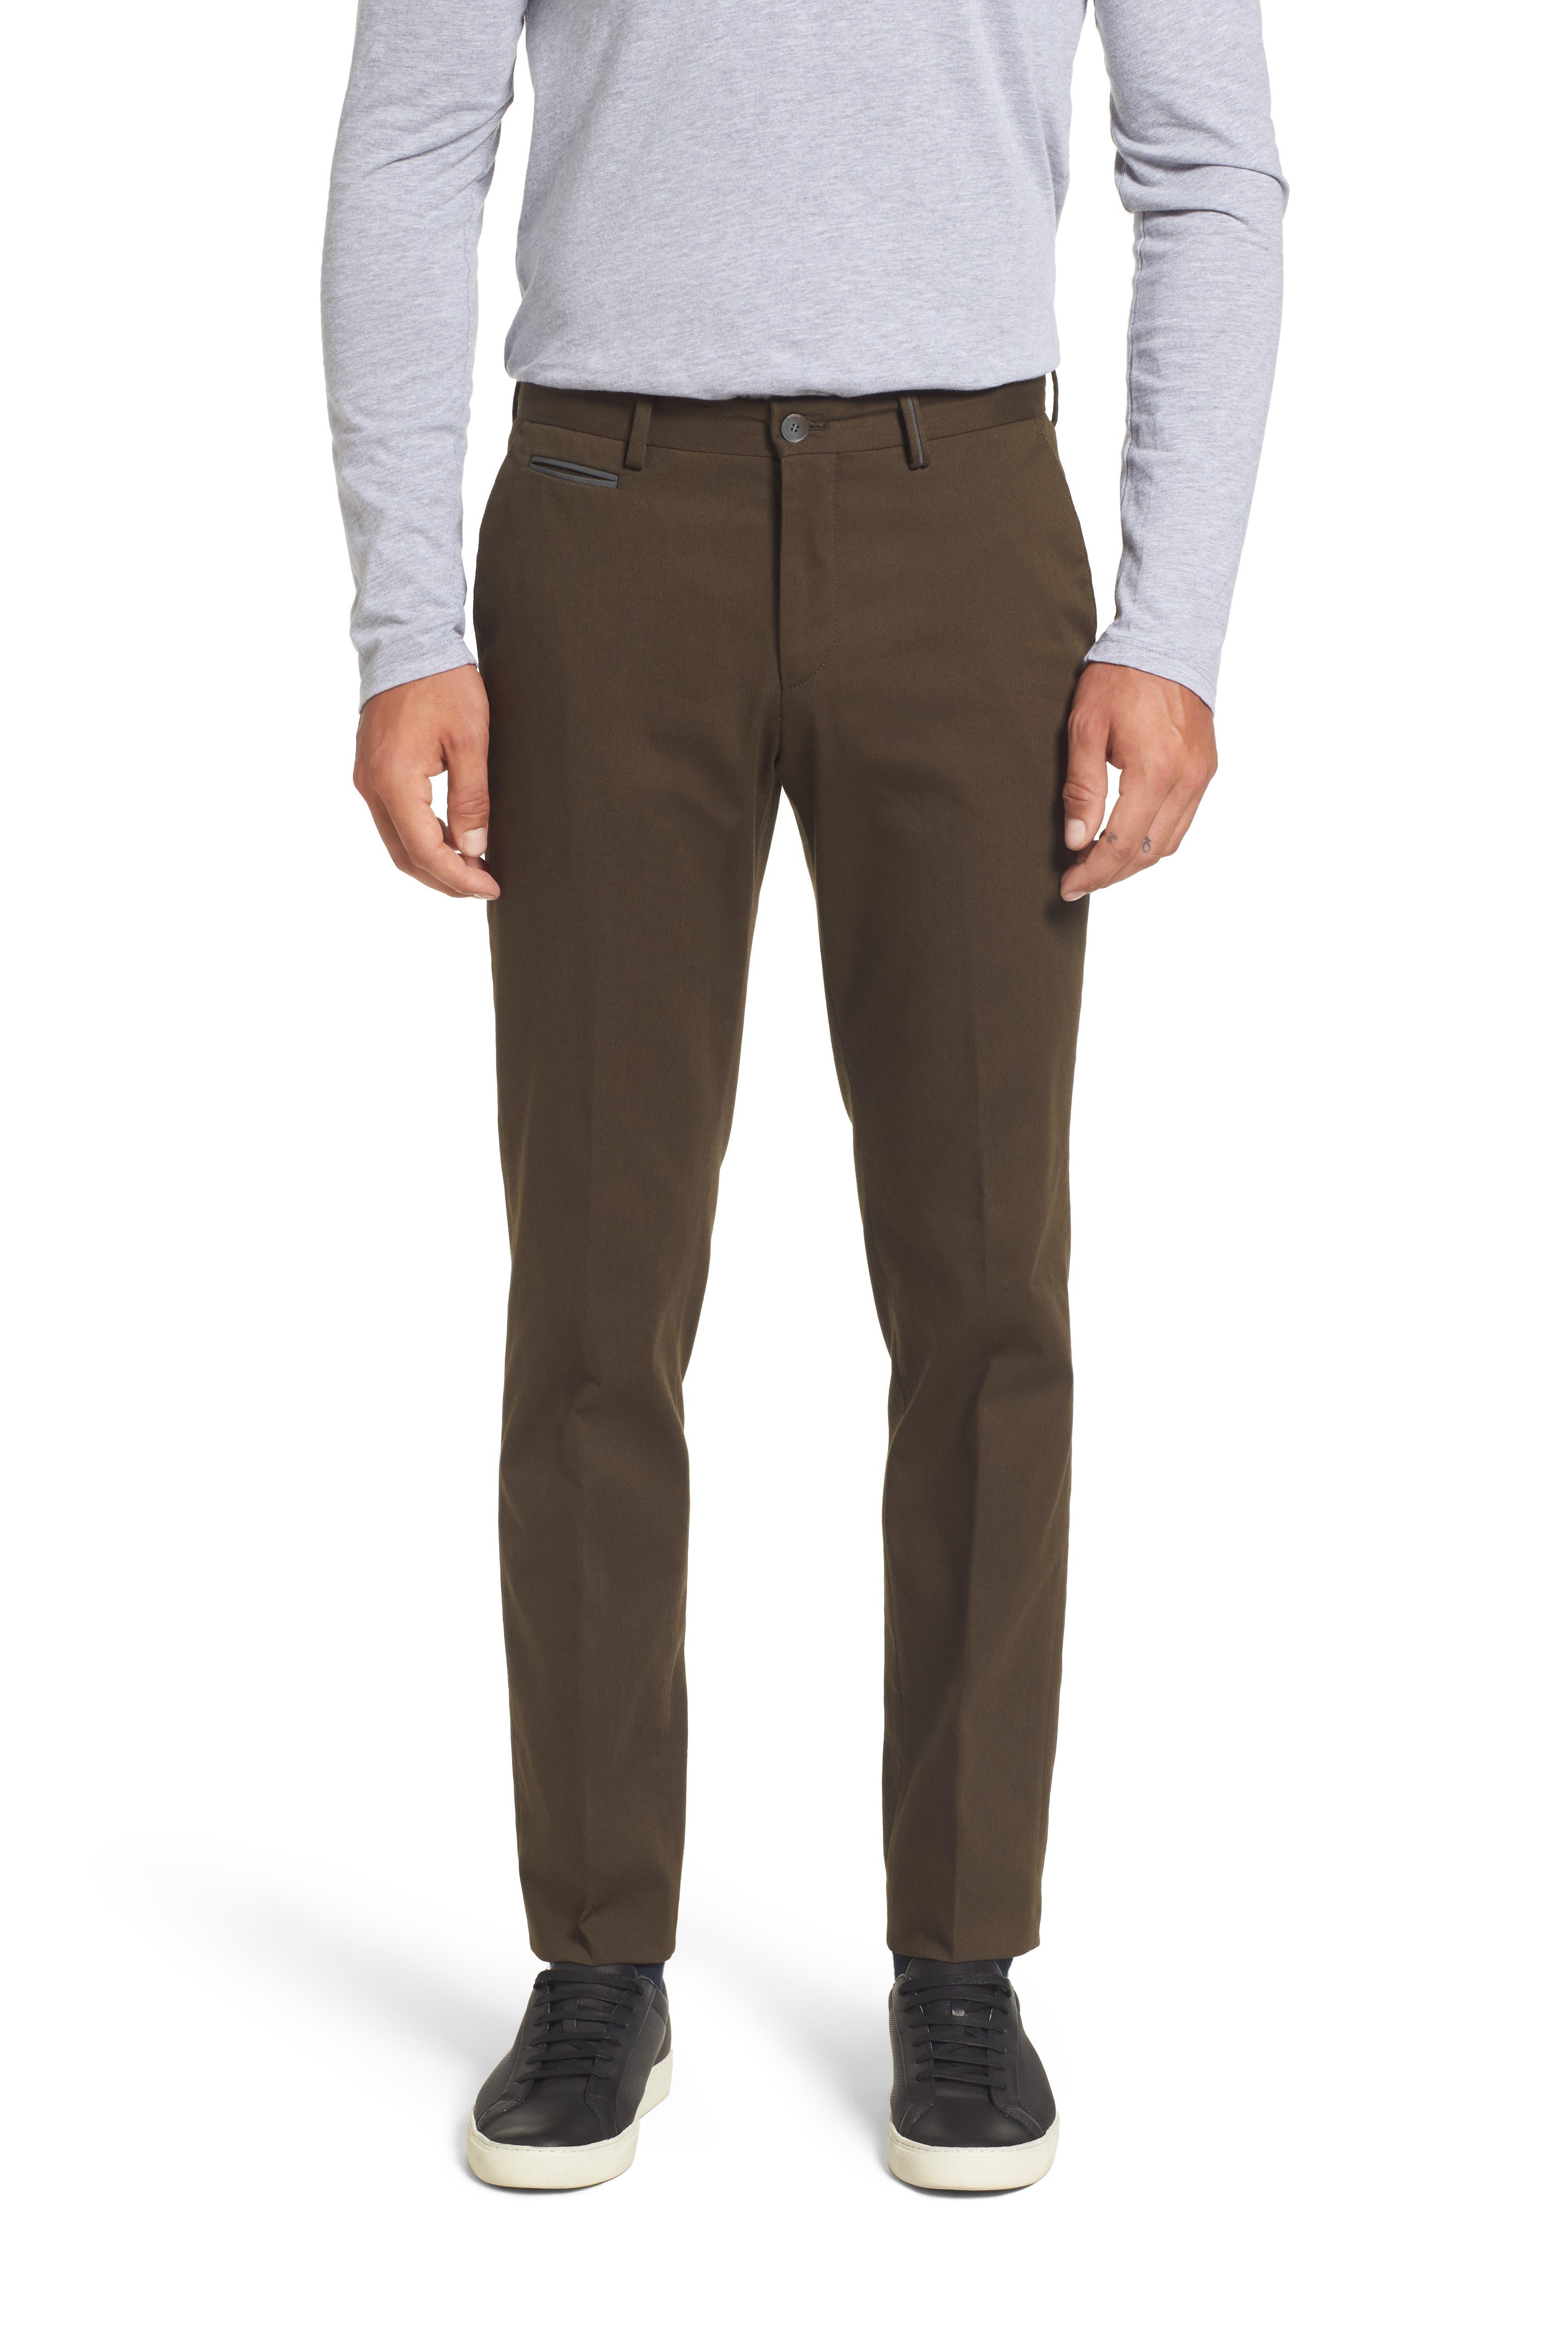 Batho-W Regular Fit Trousers,                         Main,                         color, Open Green